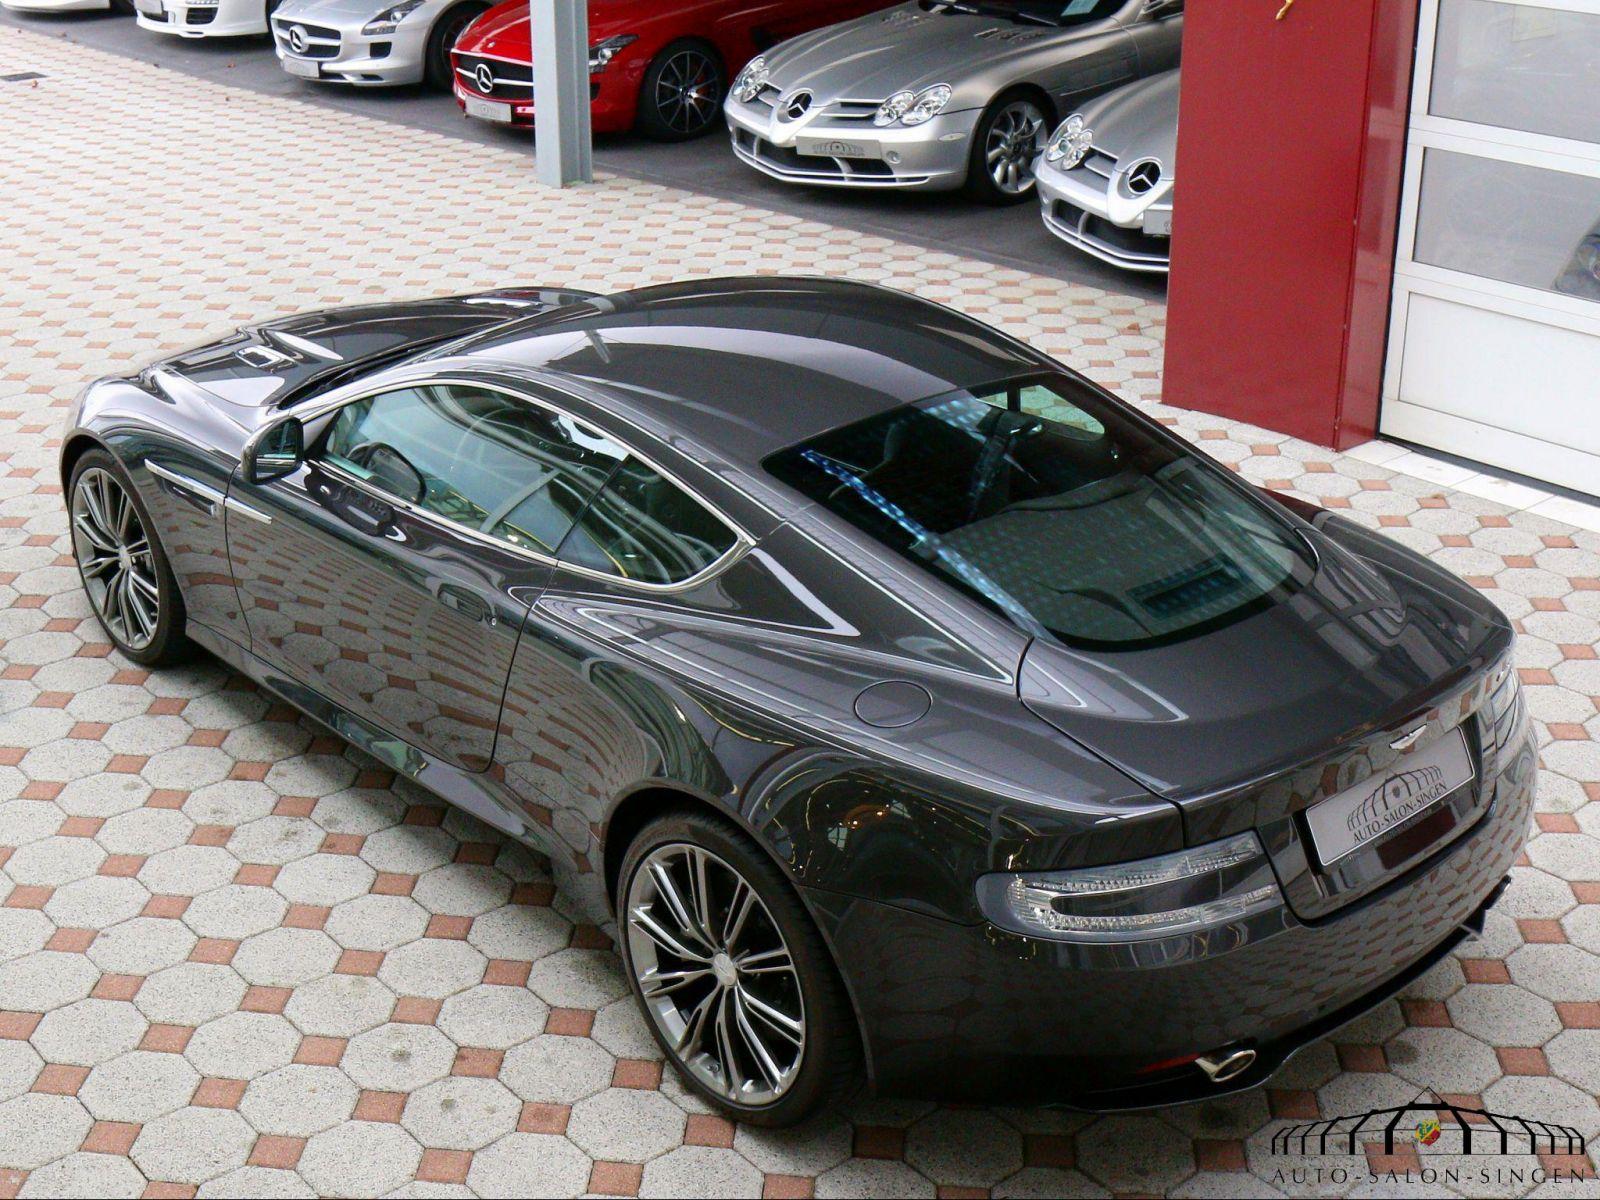 Aston Martin Virage Coupe V12 Coupé Auto Salon Singen